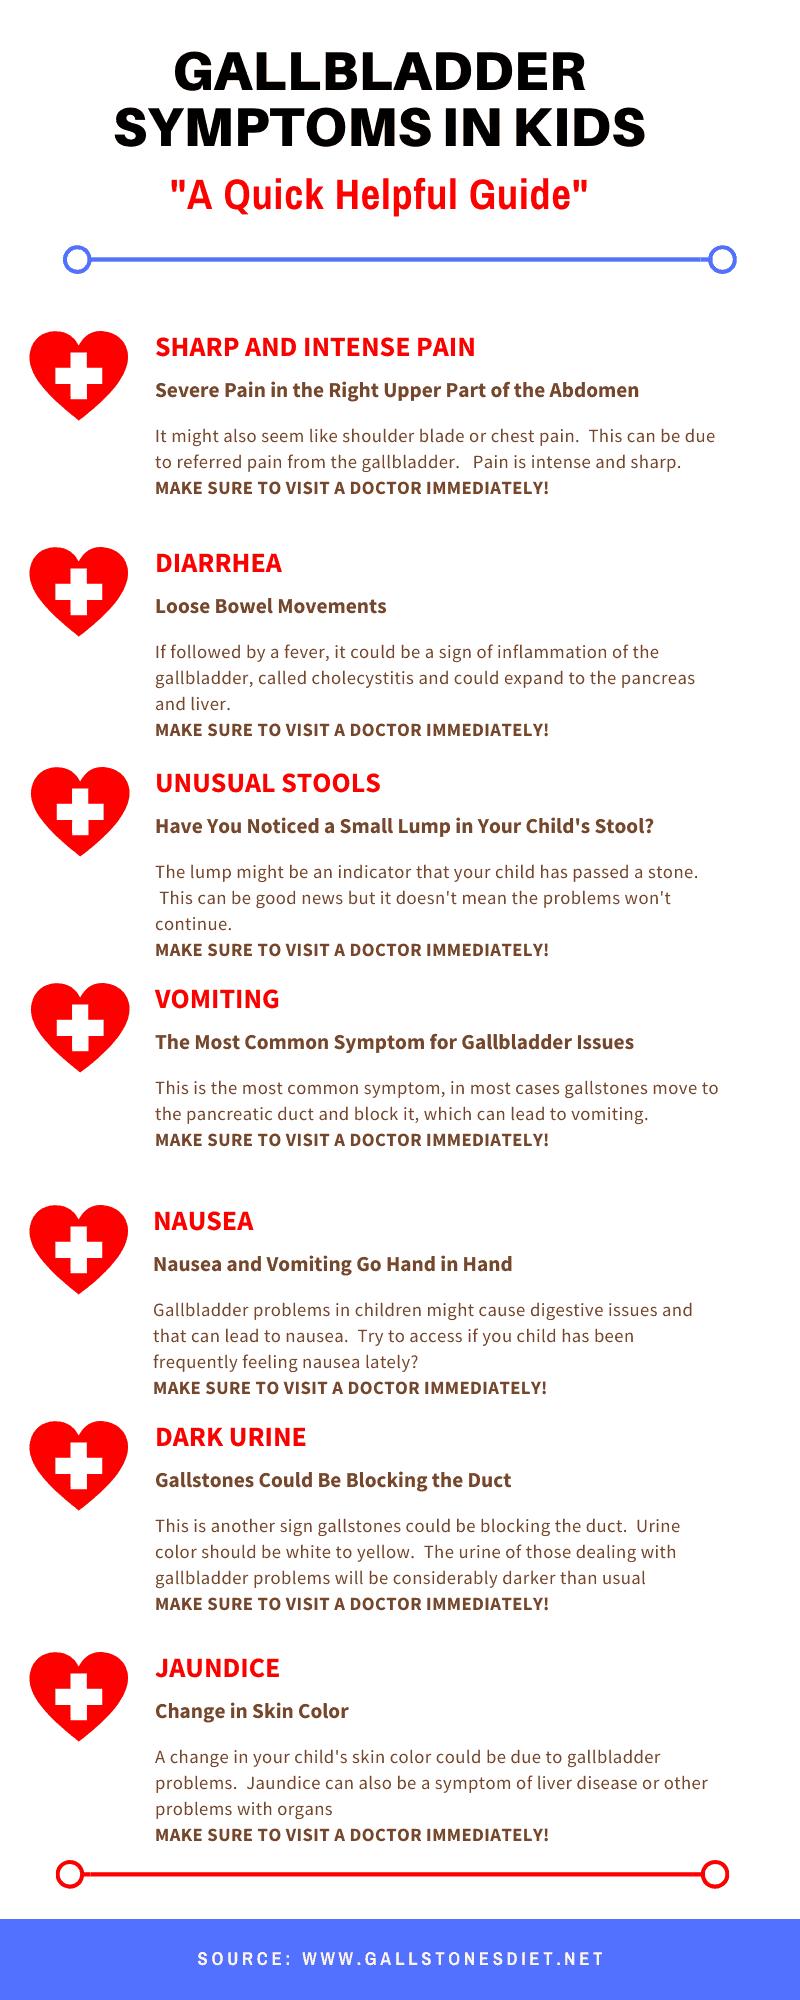 Gallbladder Symptoms in kids